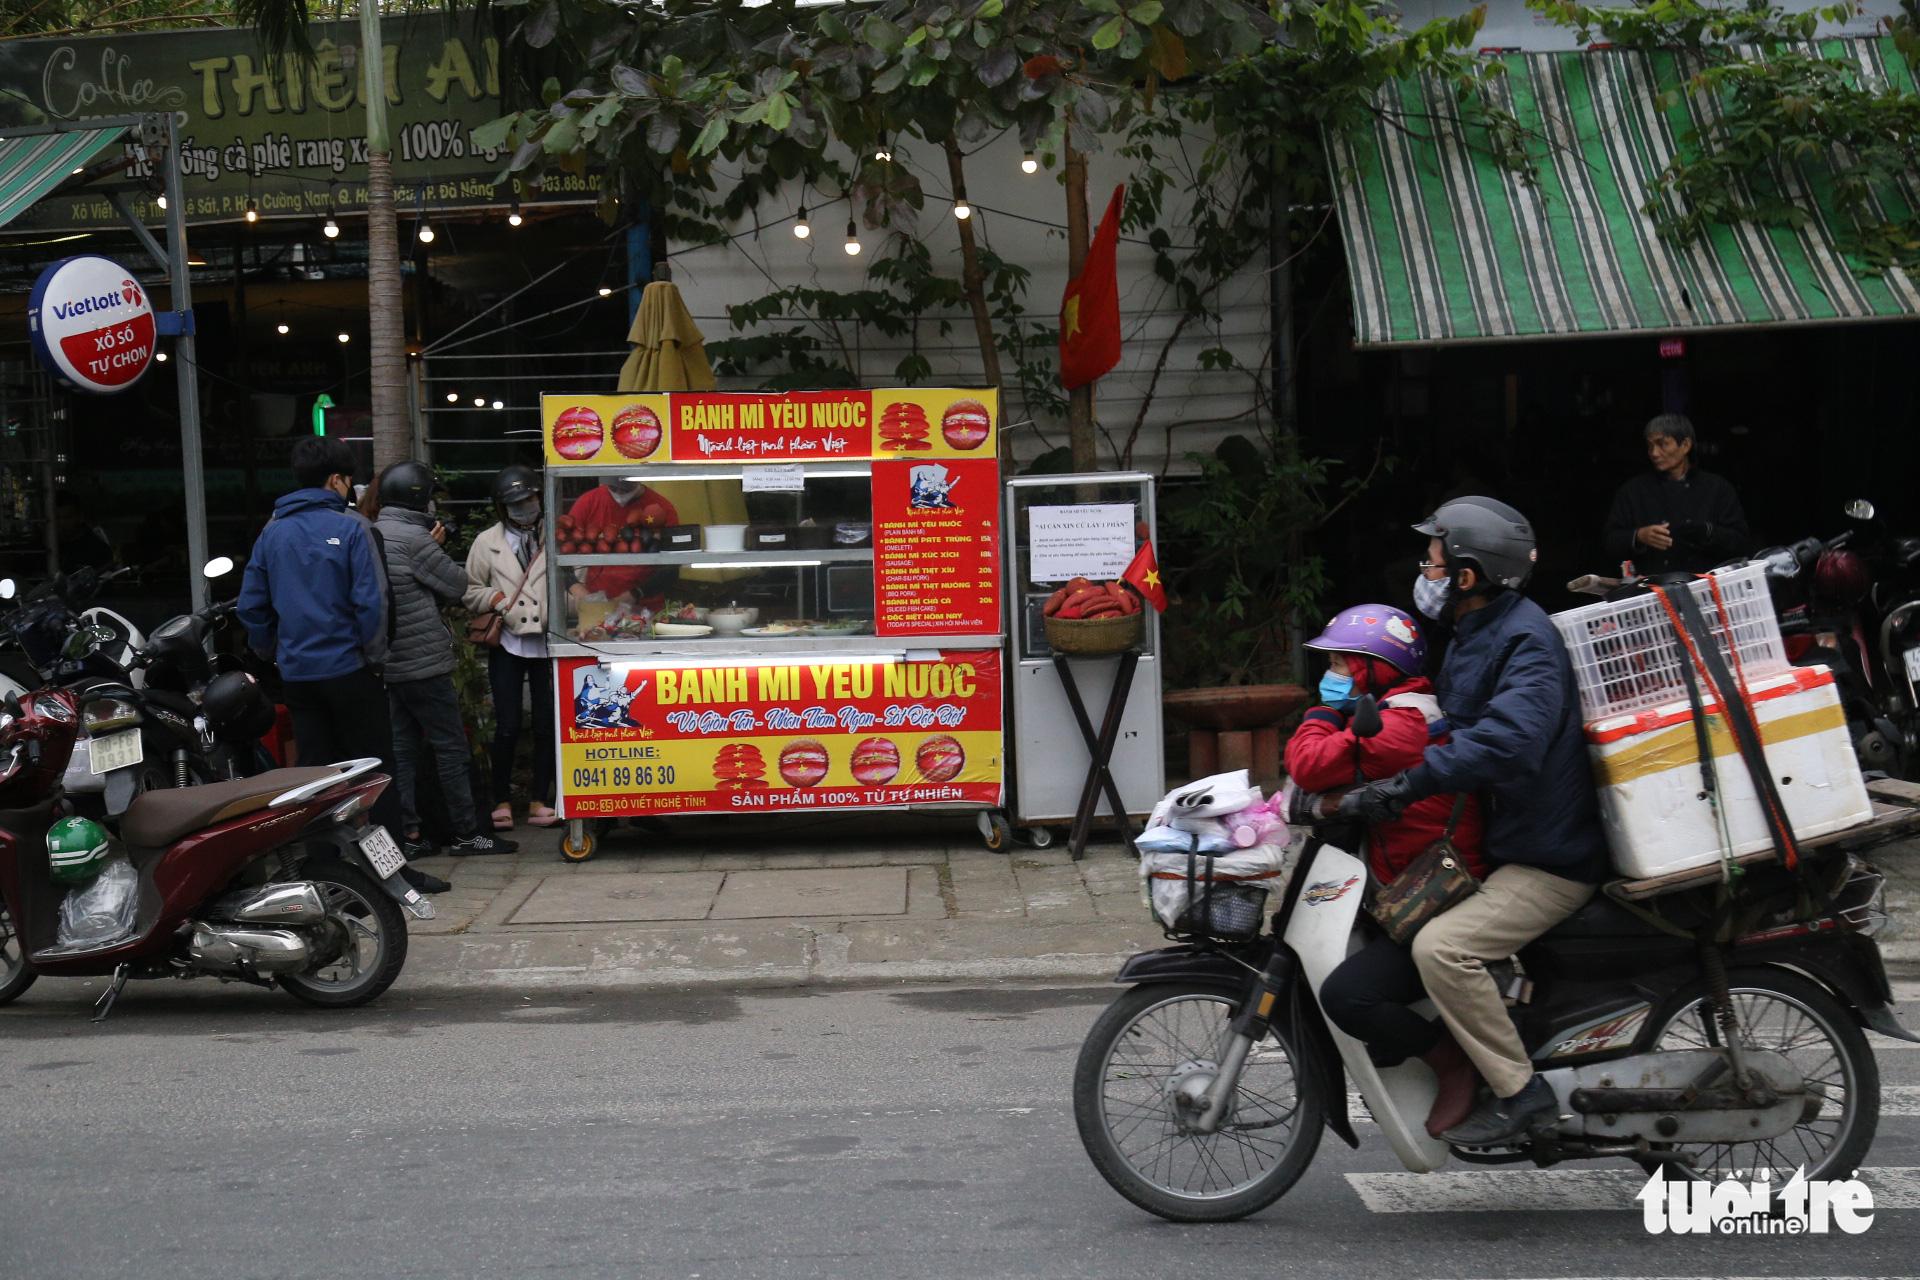 The Banh mi yeu nuoc (Patriotic 'banh mi') stand on Xo Viet Nghe Tinh Street in Hai Chau District, Da Nang City, Vietnam. Photo: Doan Nhan / Tuoi Tre